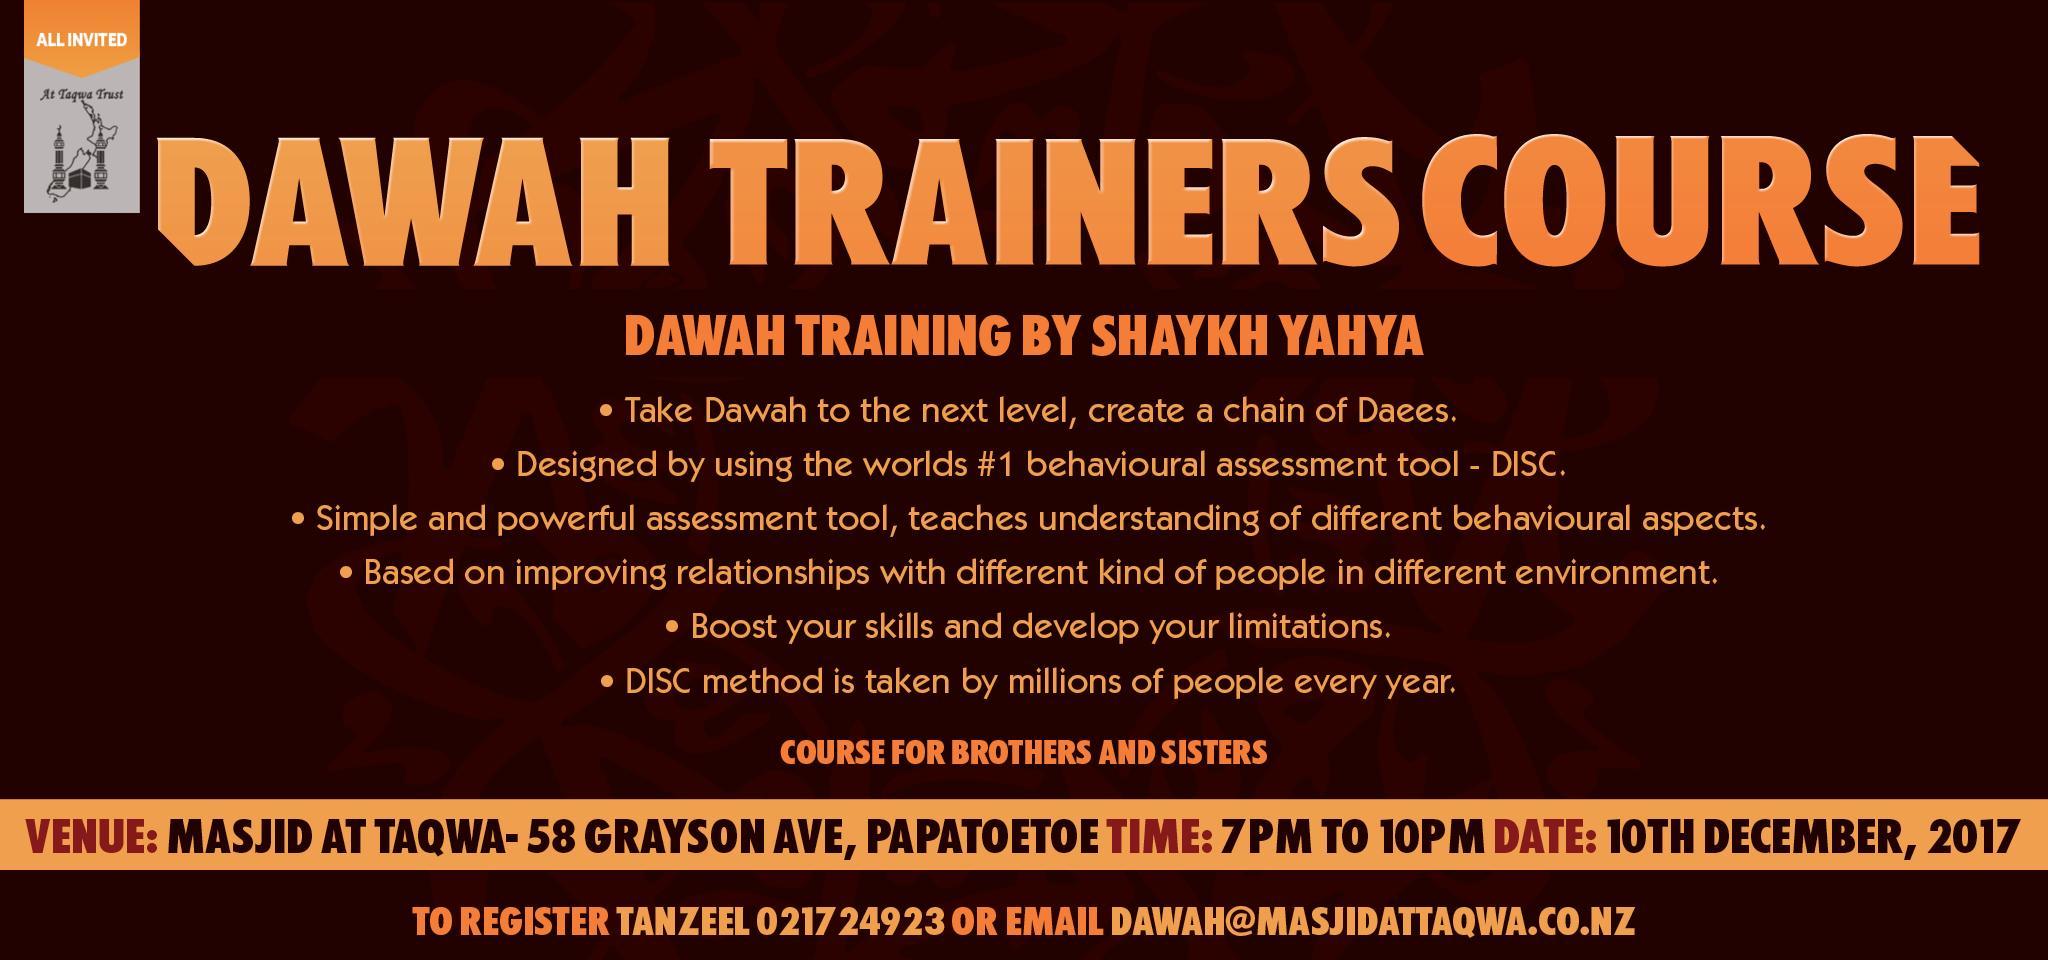 da'wah-trainers-course_slider